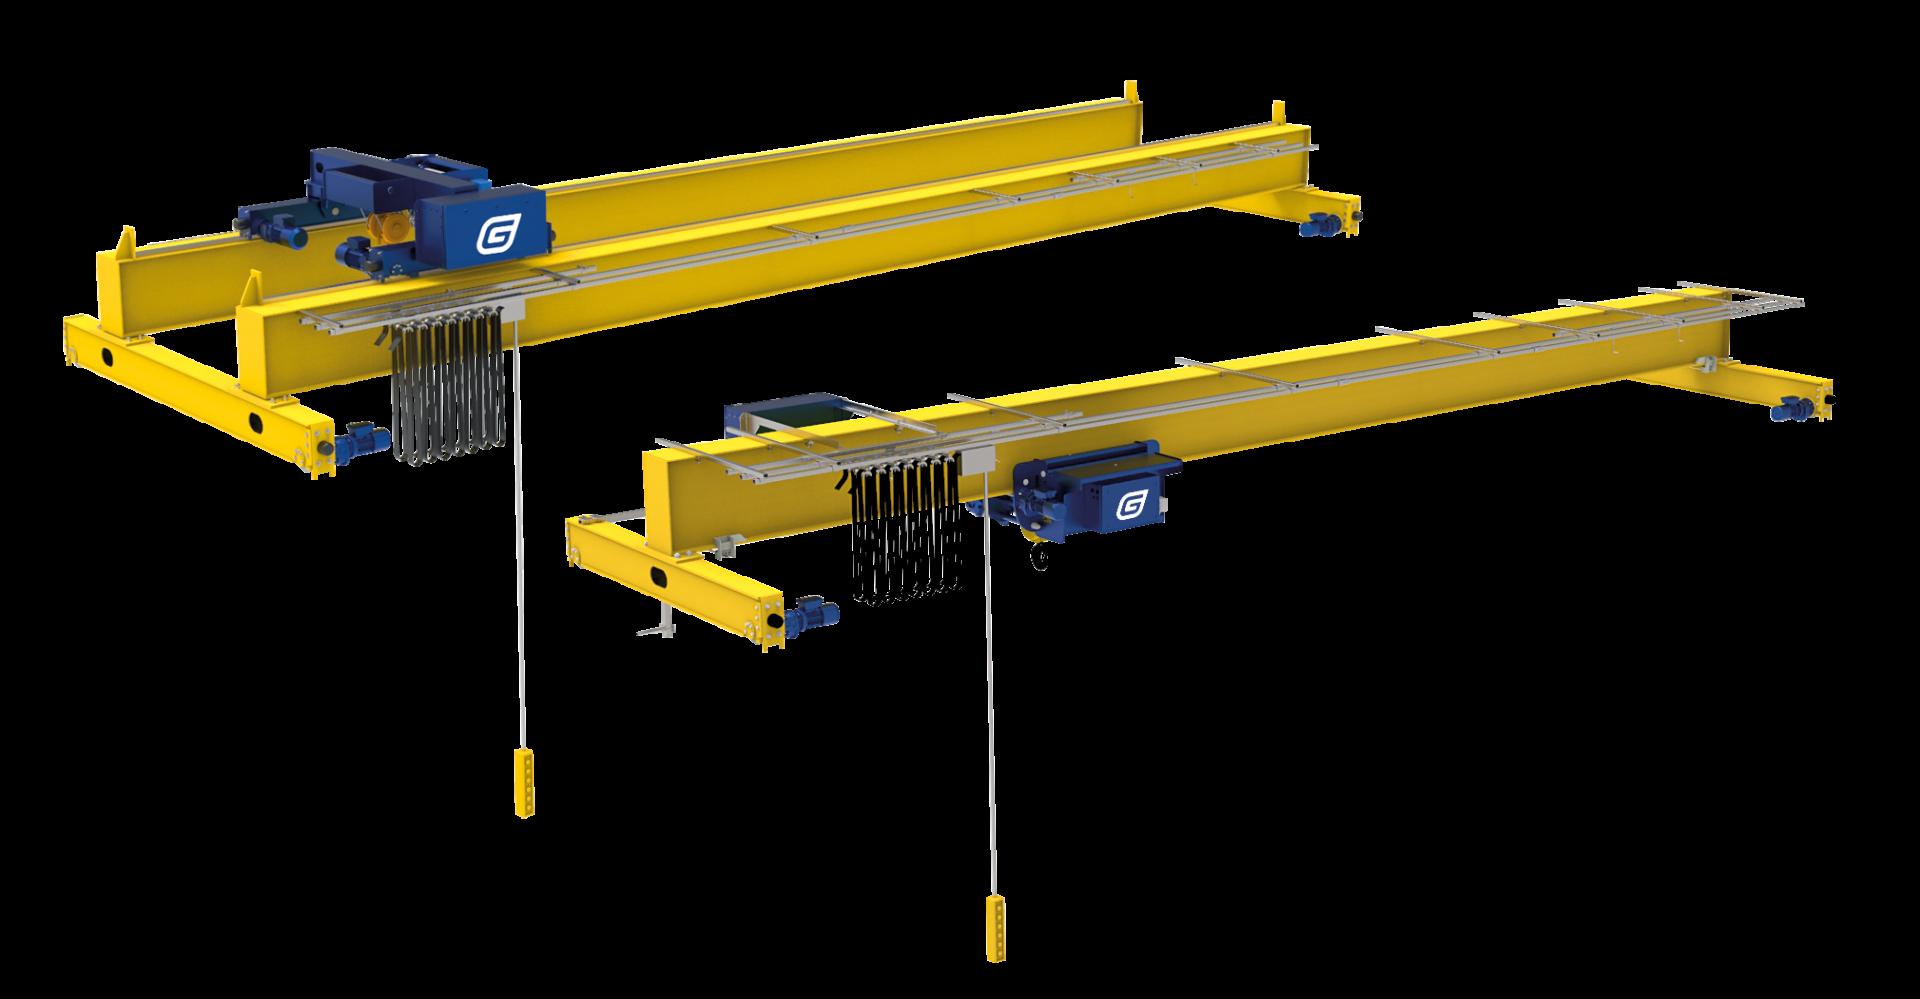 Gloning Crane Components - GCC Kran Kit